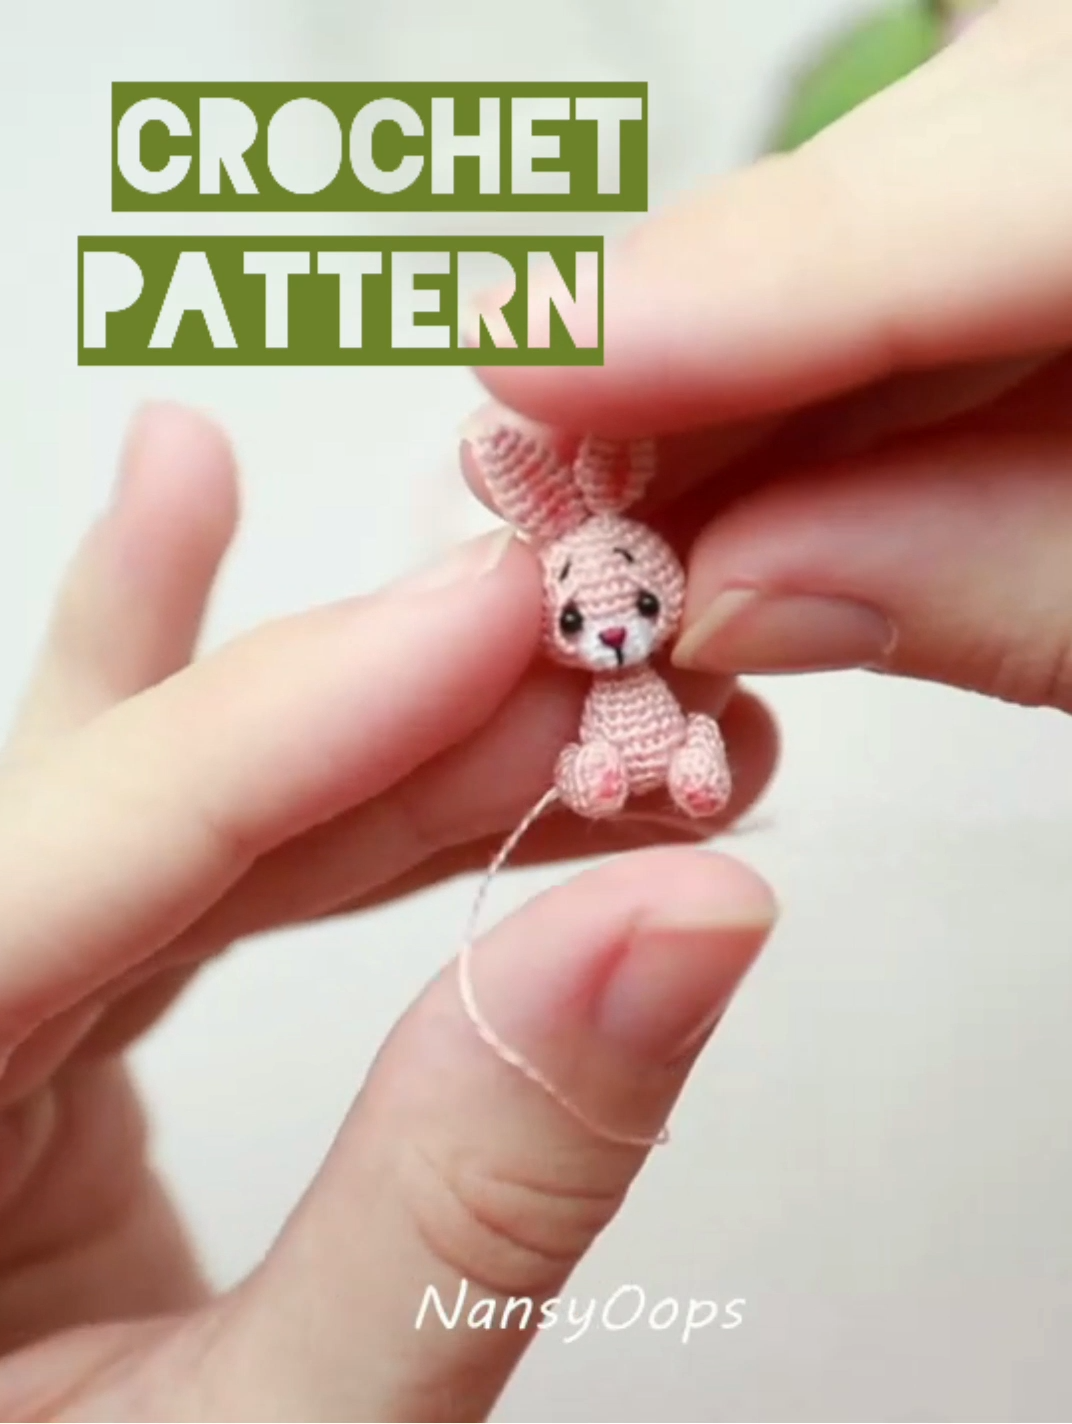 Crochet bunny pattern micro amigurumi pdf tutotial amigurumi bunny pattern by NansyOops